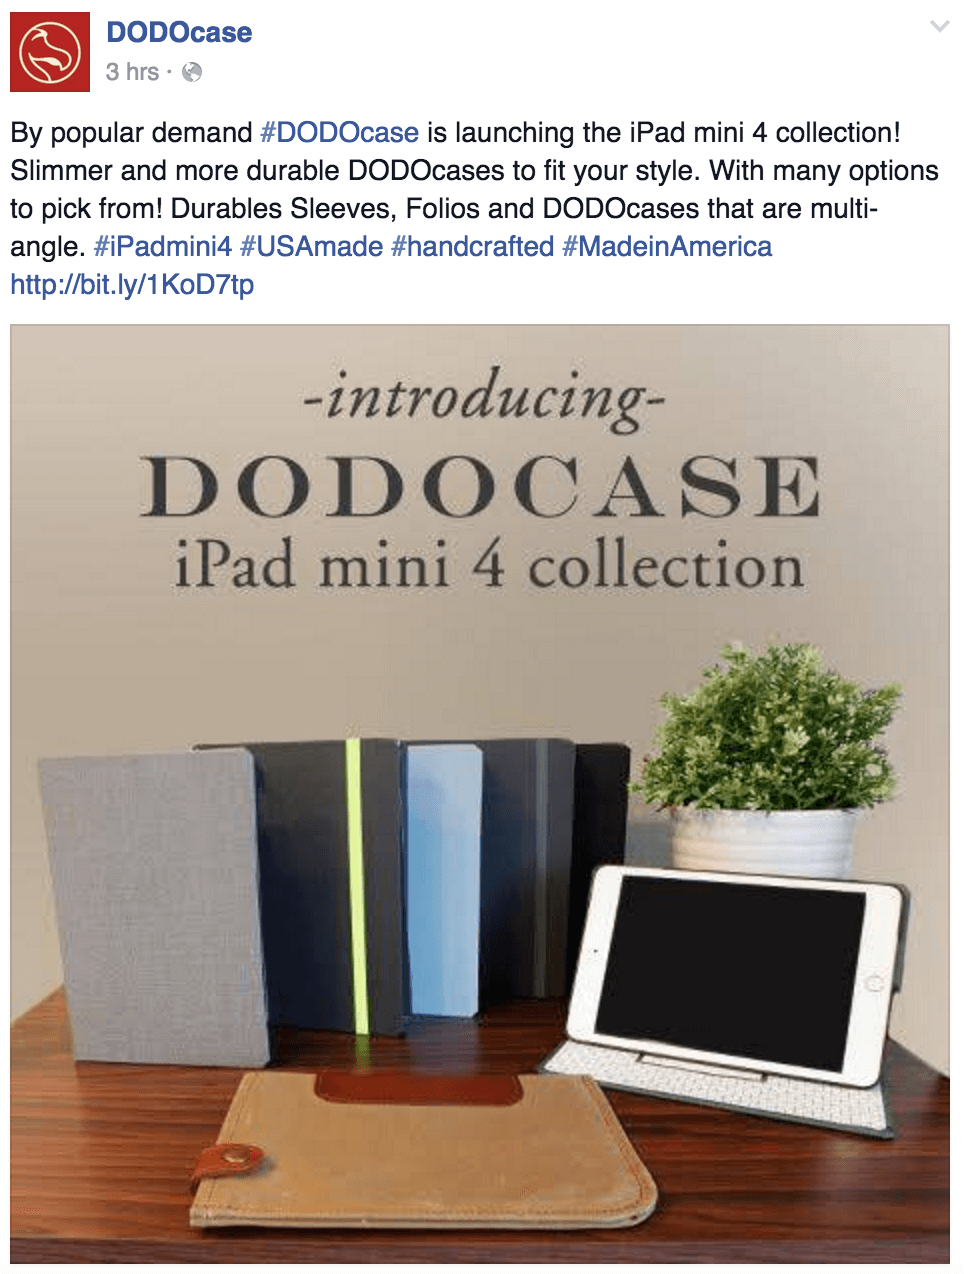 new dodocase product